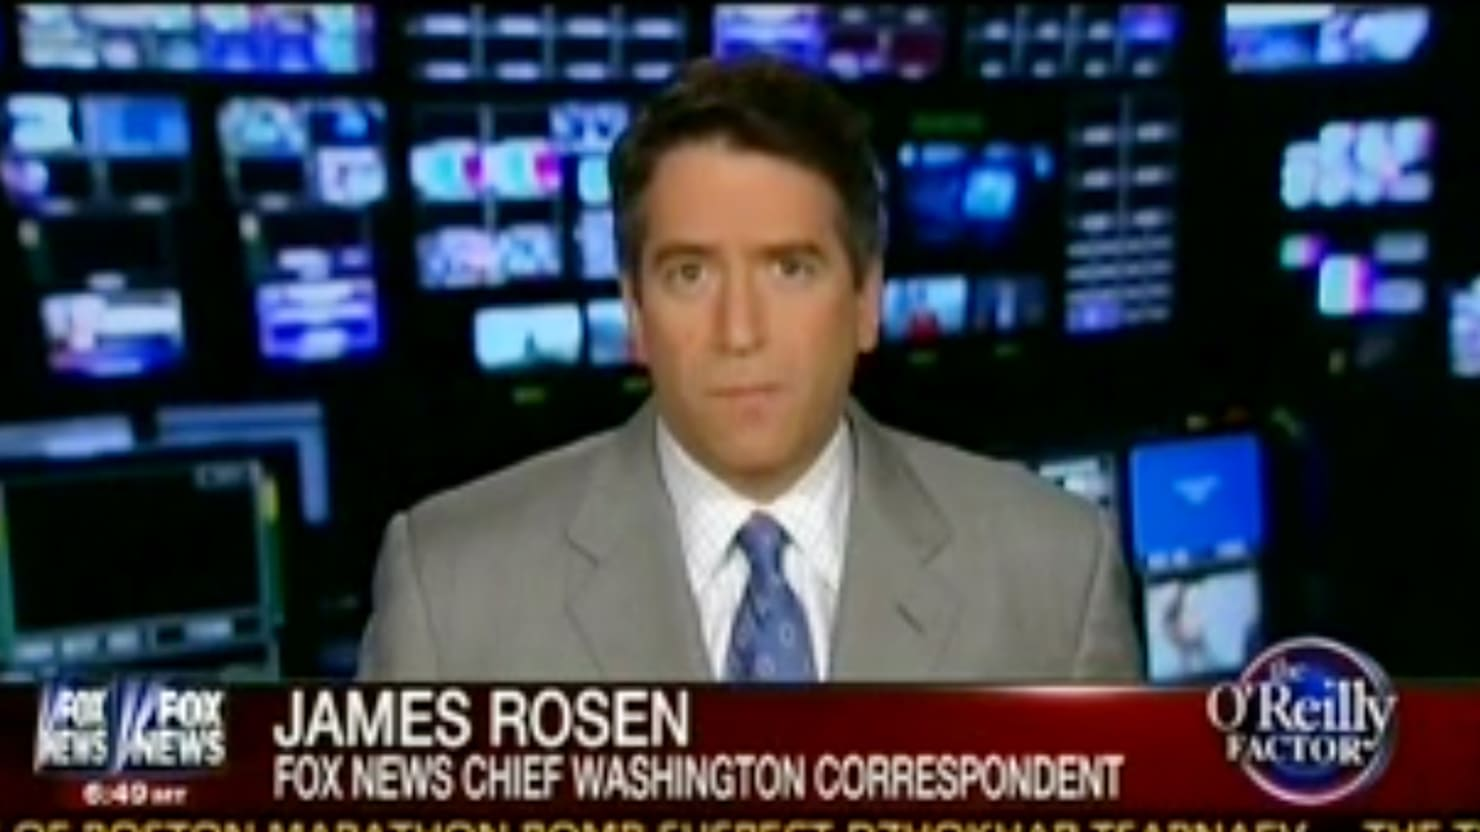 Fox News, via Media Matters